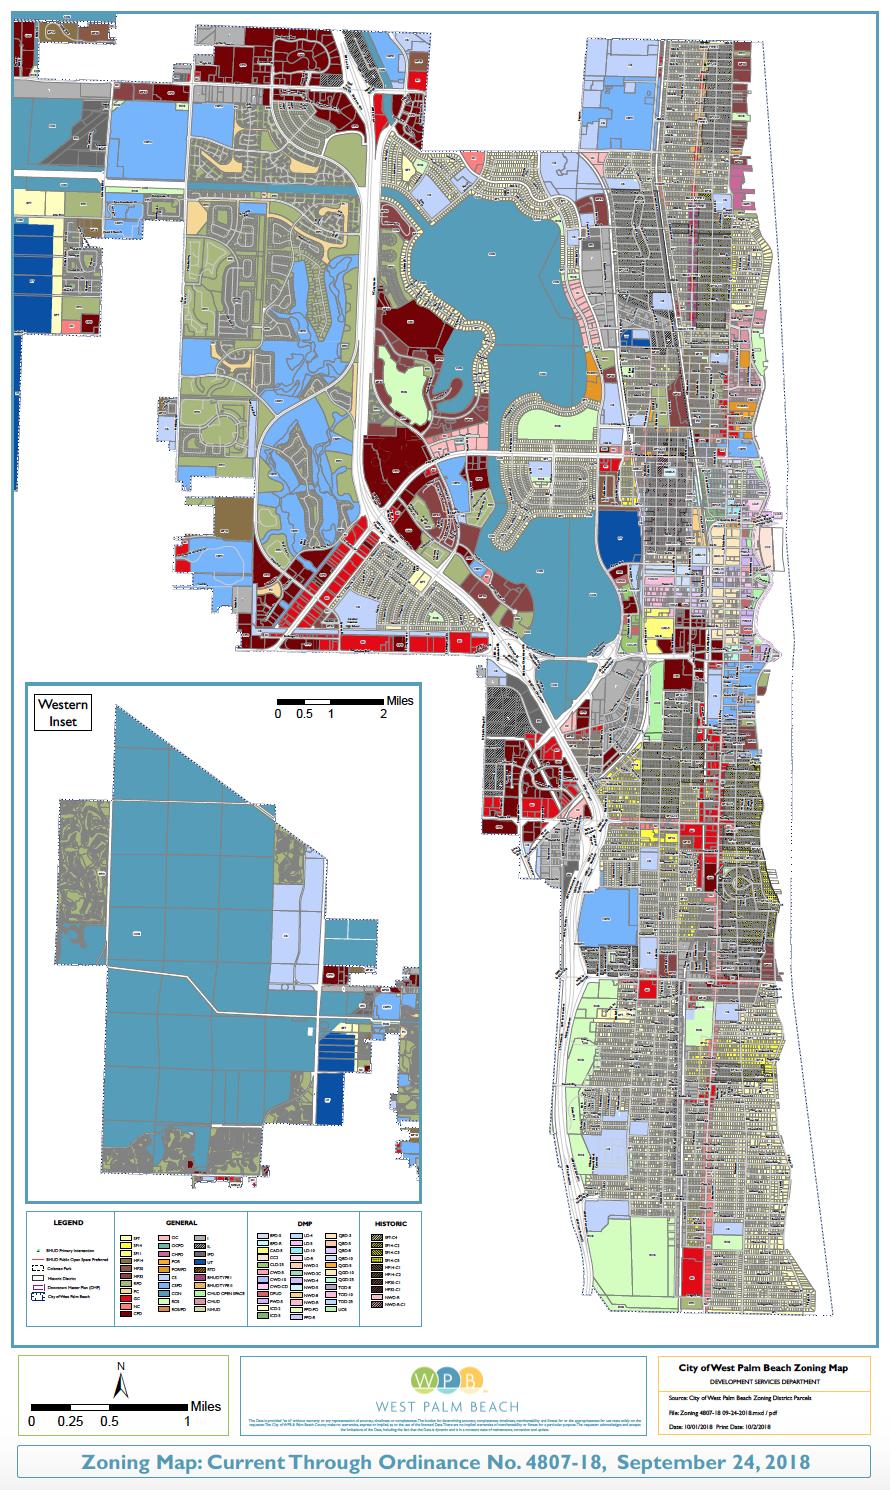 west palm beach commercial property for sale development florida